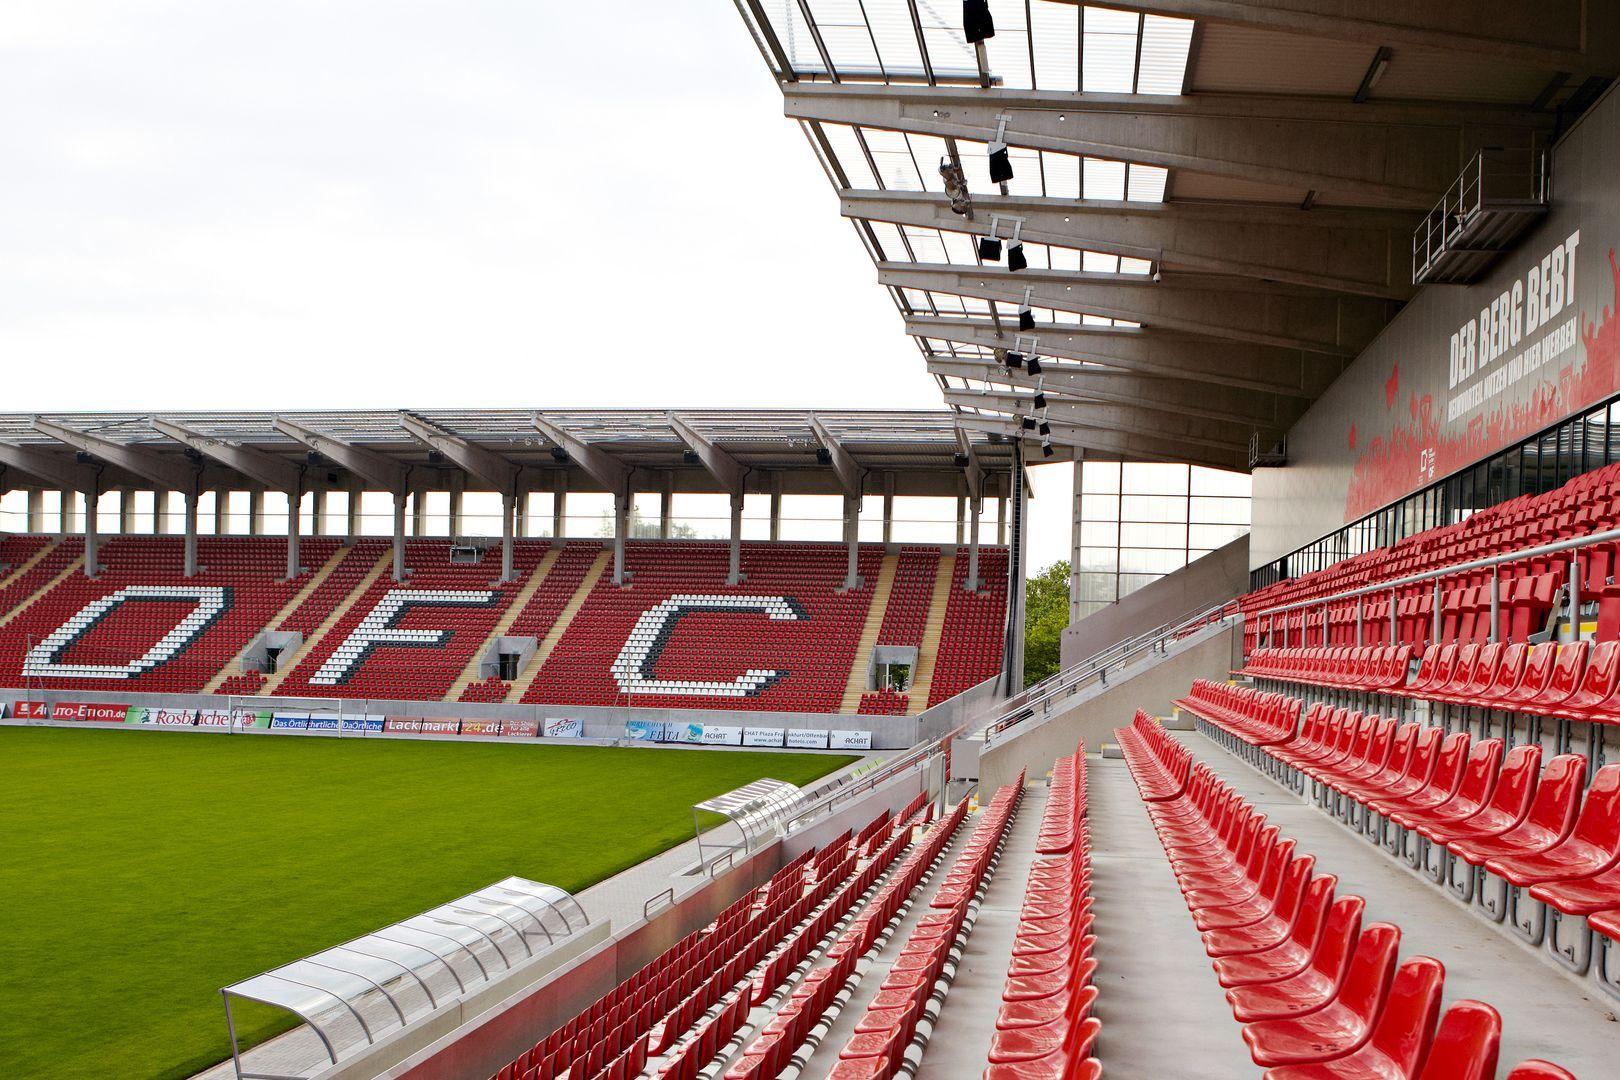 Sparda Bank Hessen Stadion Offenbach Am Main Alemania Capacidad 20 500 Espectadores Equipo Local Kickers Offenba Kickers Offenbach Offenbach Am Main Kicker